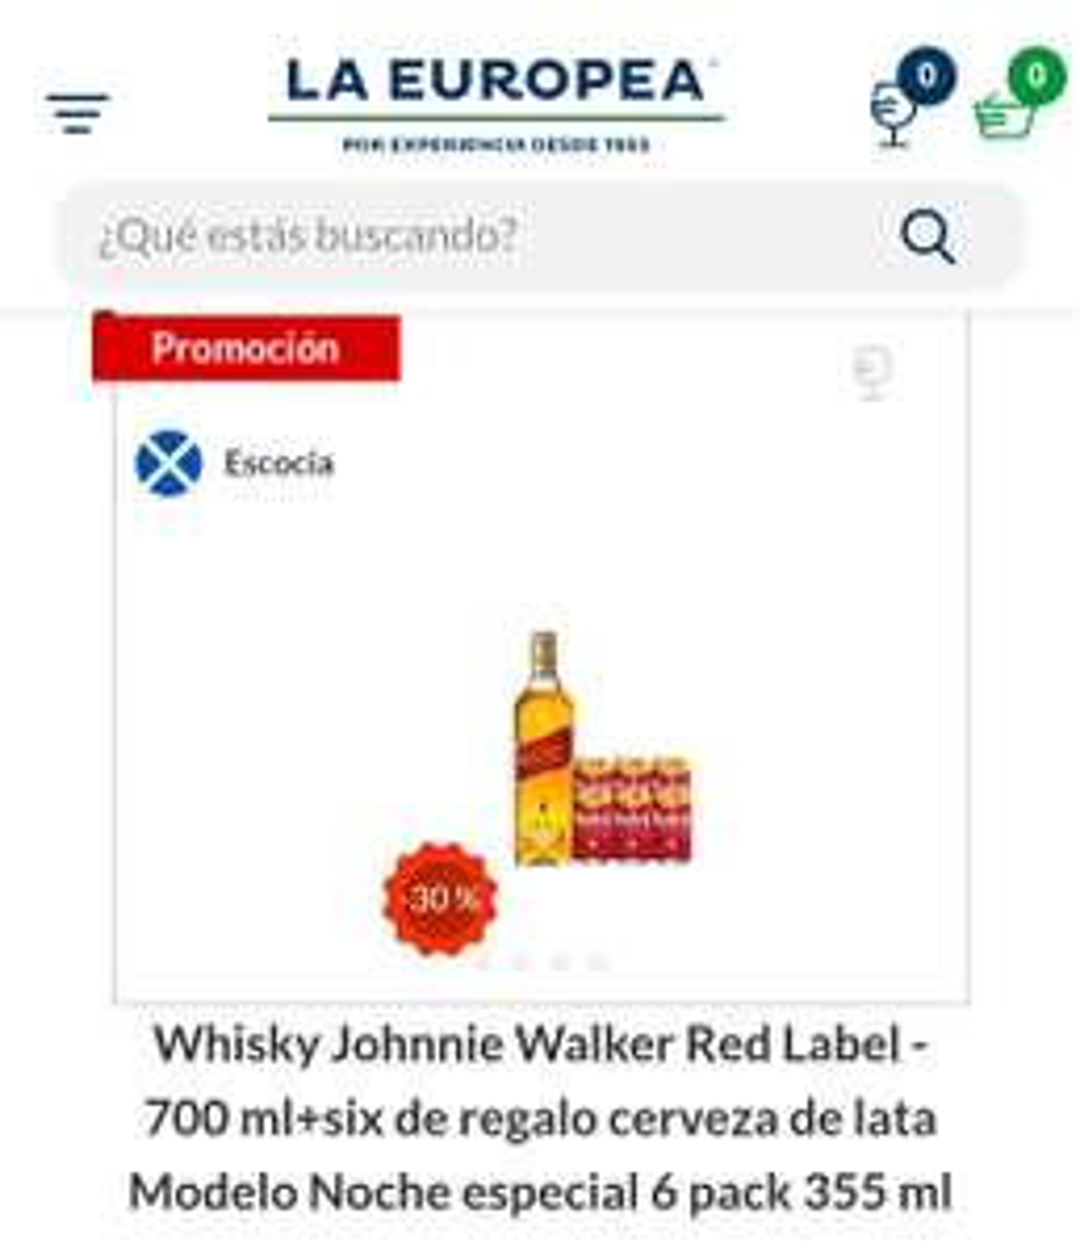 La Europea Whisky Johnnie Walker Red Label - 700 ml+six de regalo cerveza de lata Modelo Noche especial 6 pack 355 ml